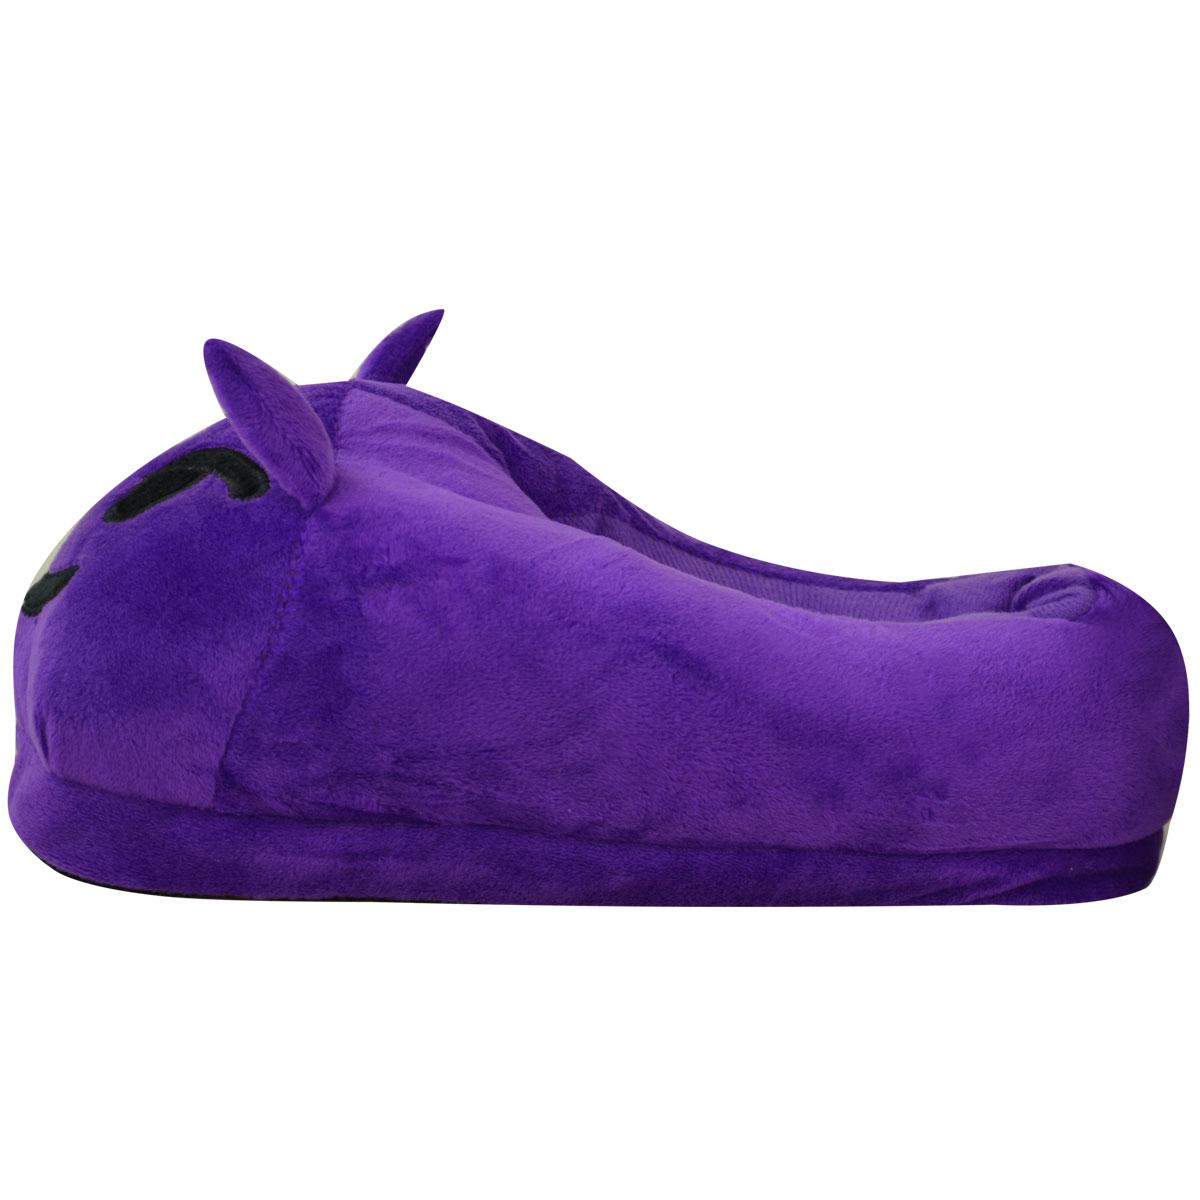 miniatura 25 - Uomini Donne Bambini Emoji Peluche imbottiti unisex Pantofola Inverno Casa Indoor Scarpe Taglia